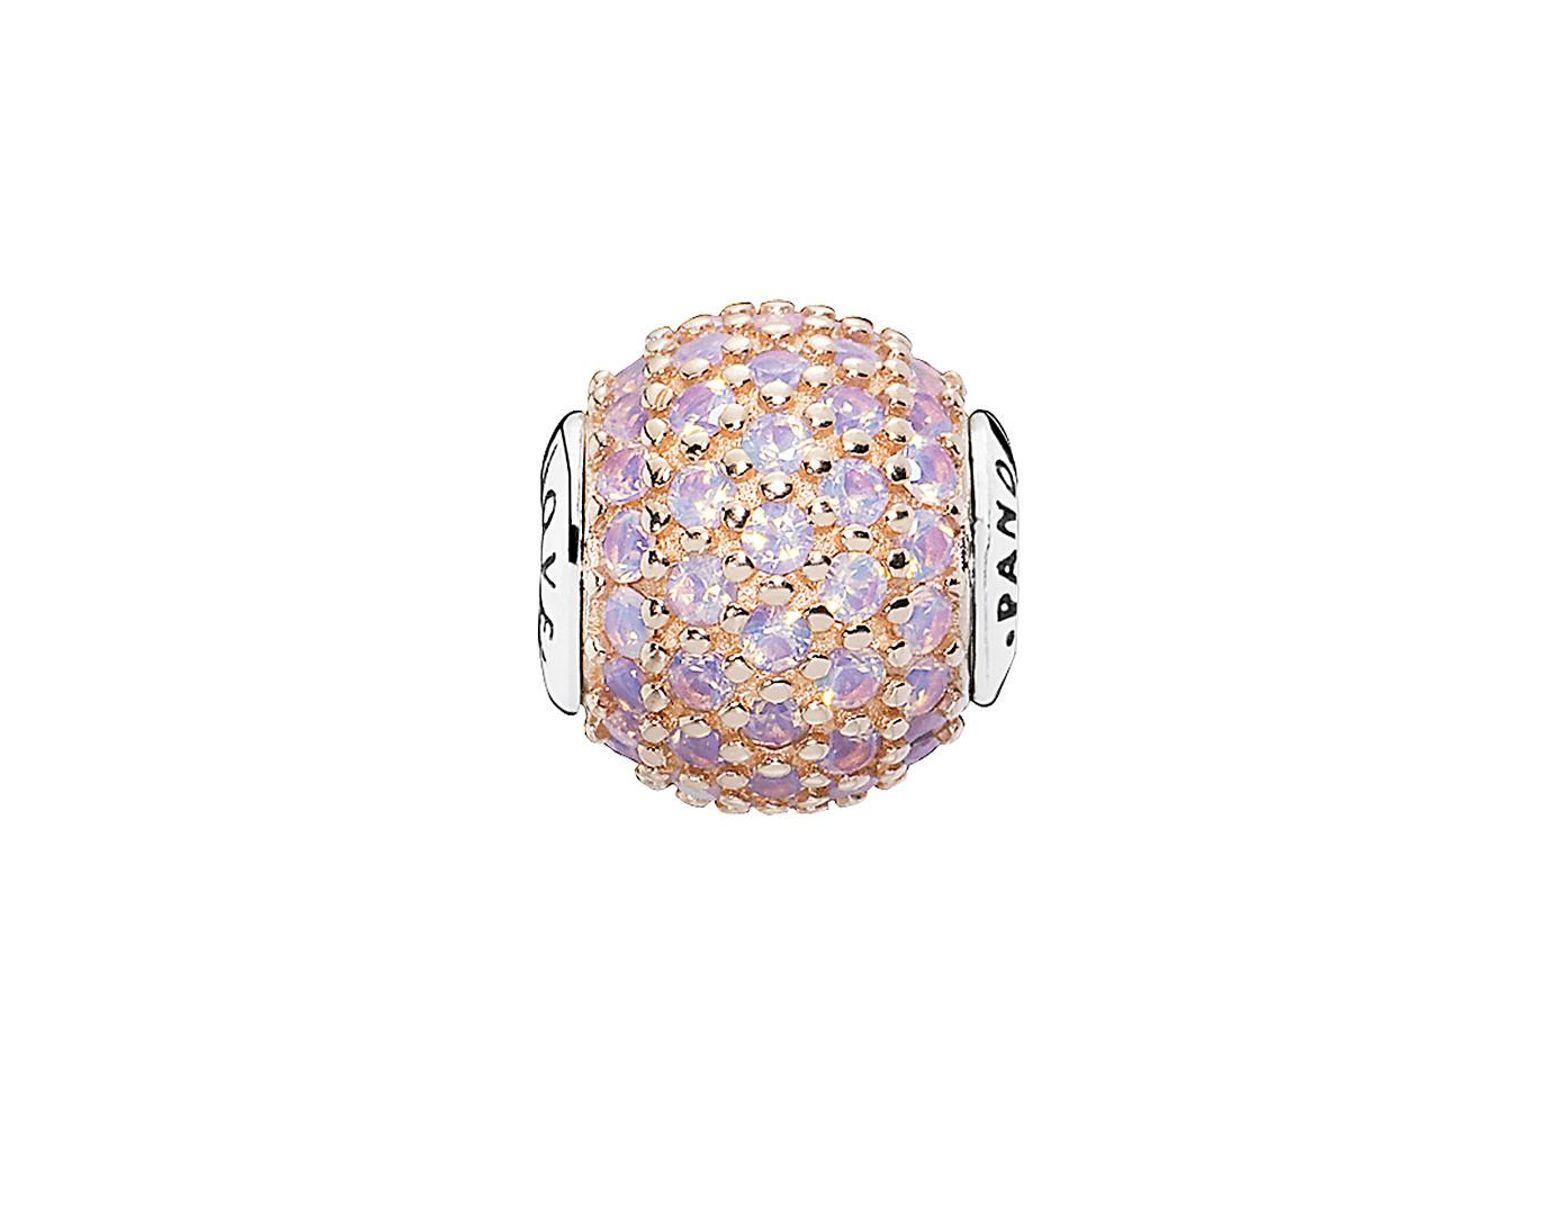 c6ae25f9b PANDORA Essence Collection Rose & Silver Crystal Love Charm - Lyst